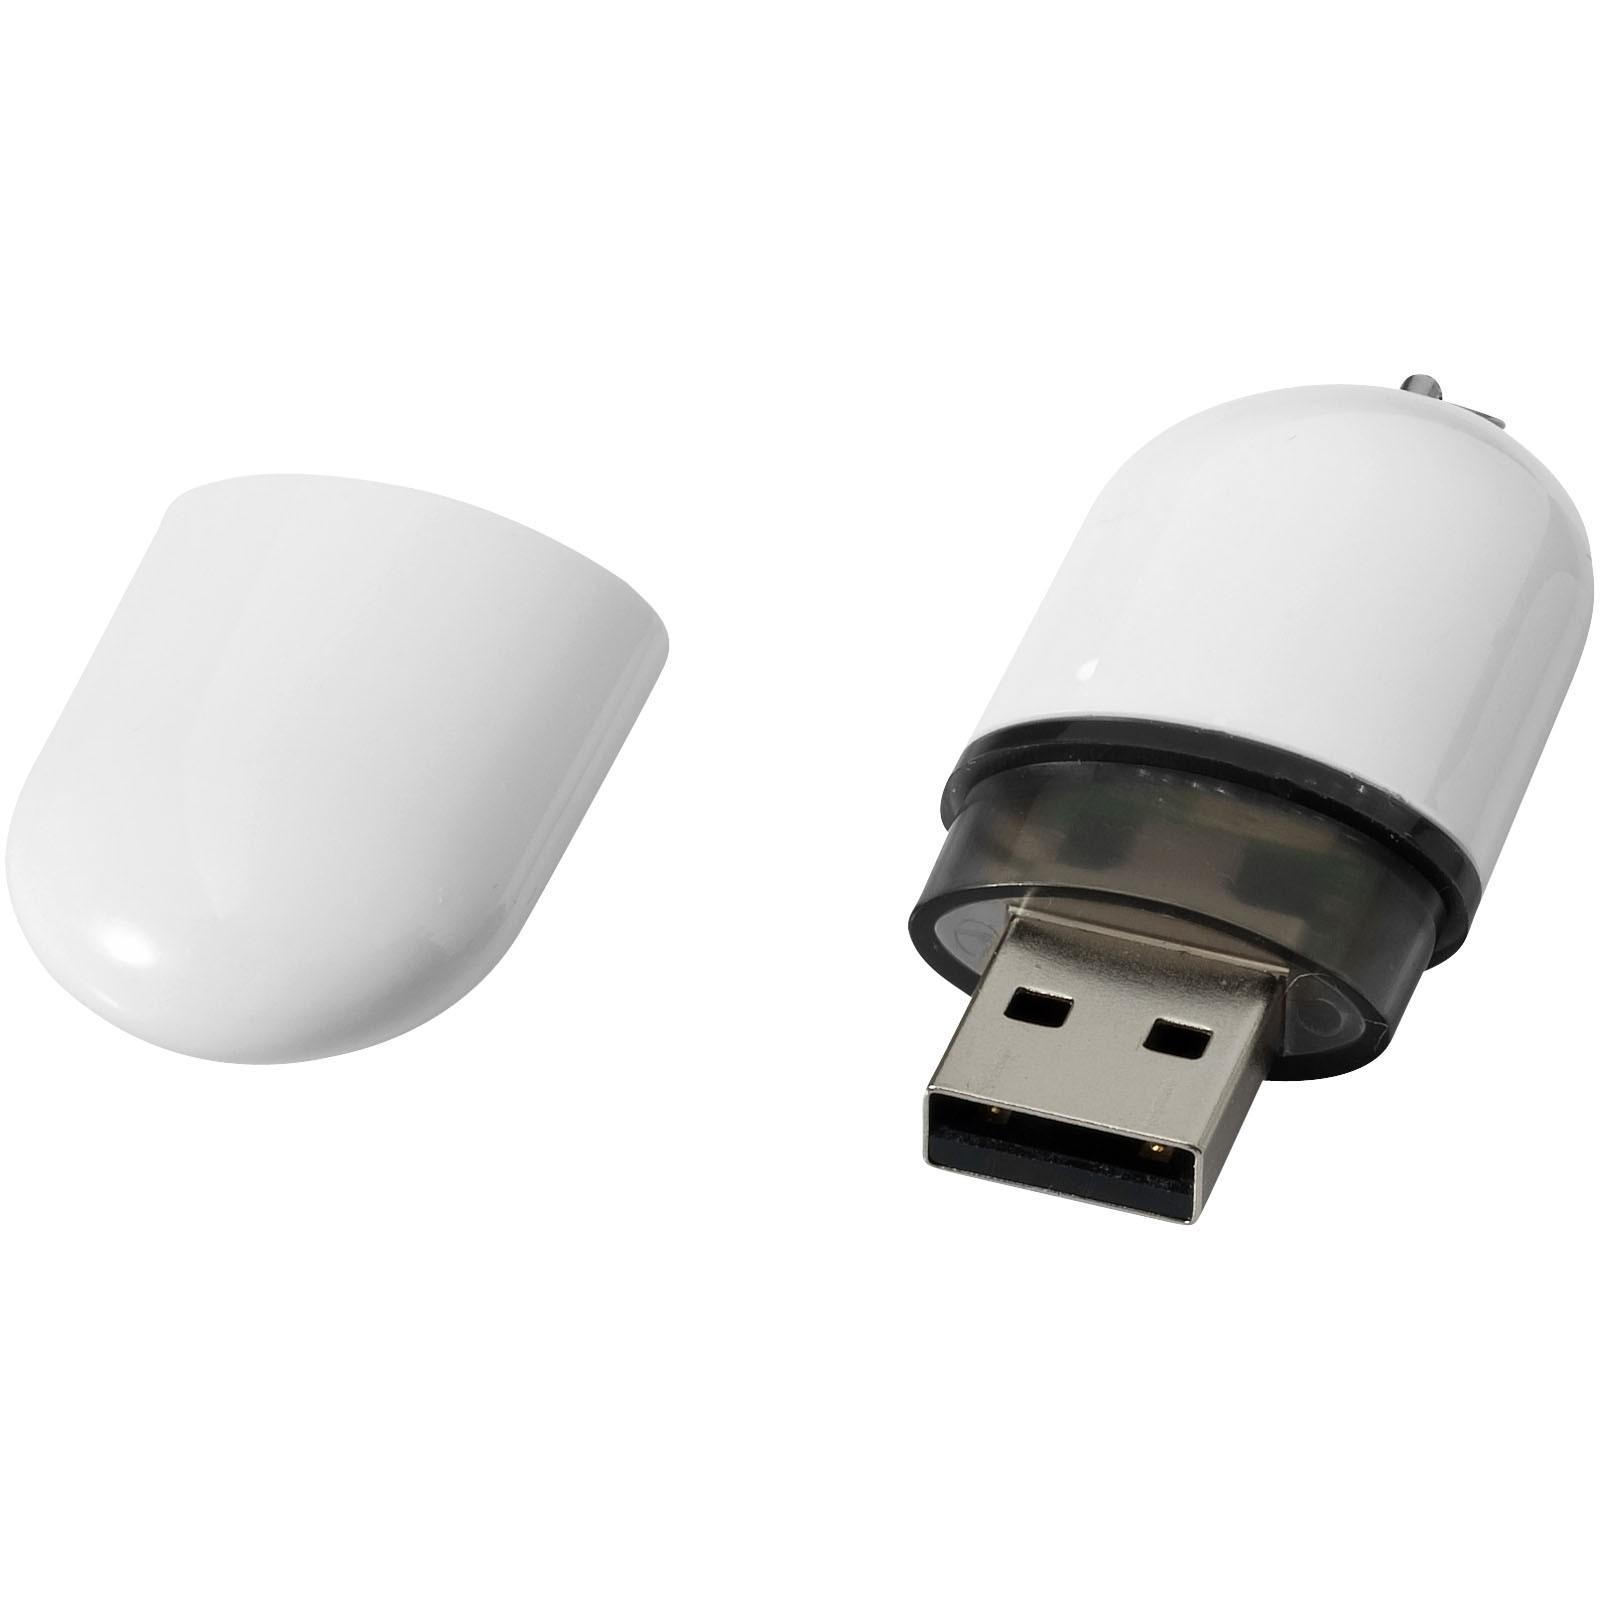 USB stick Business - White / 4GB